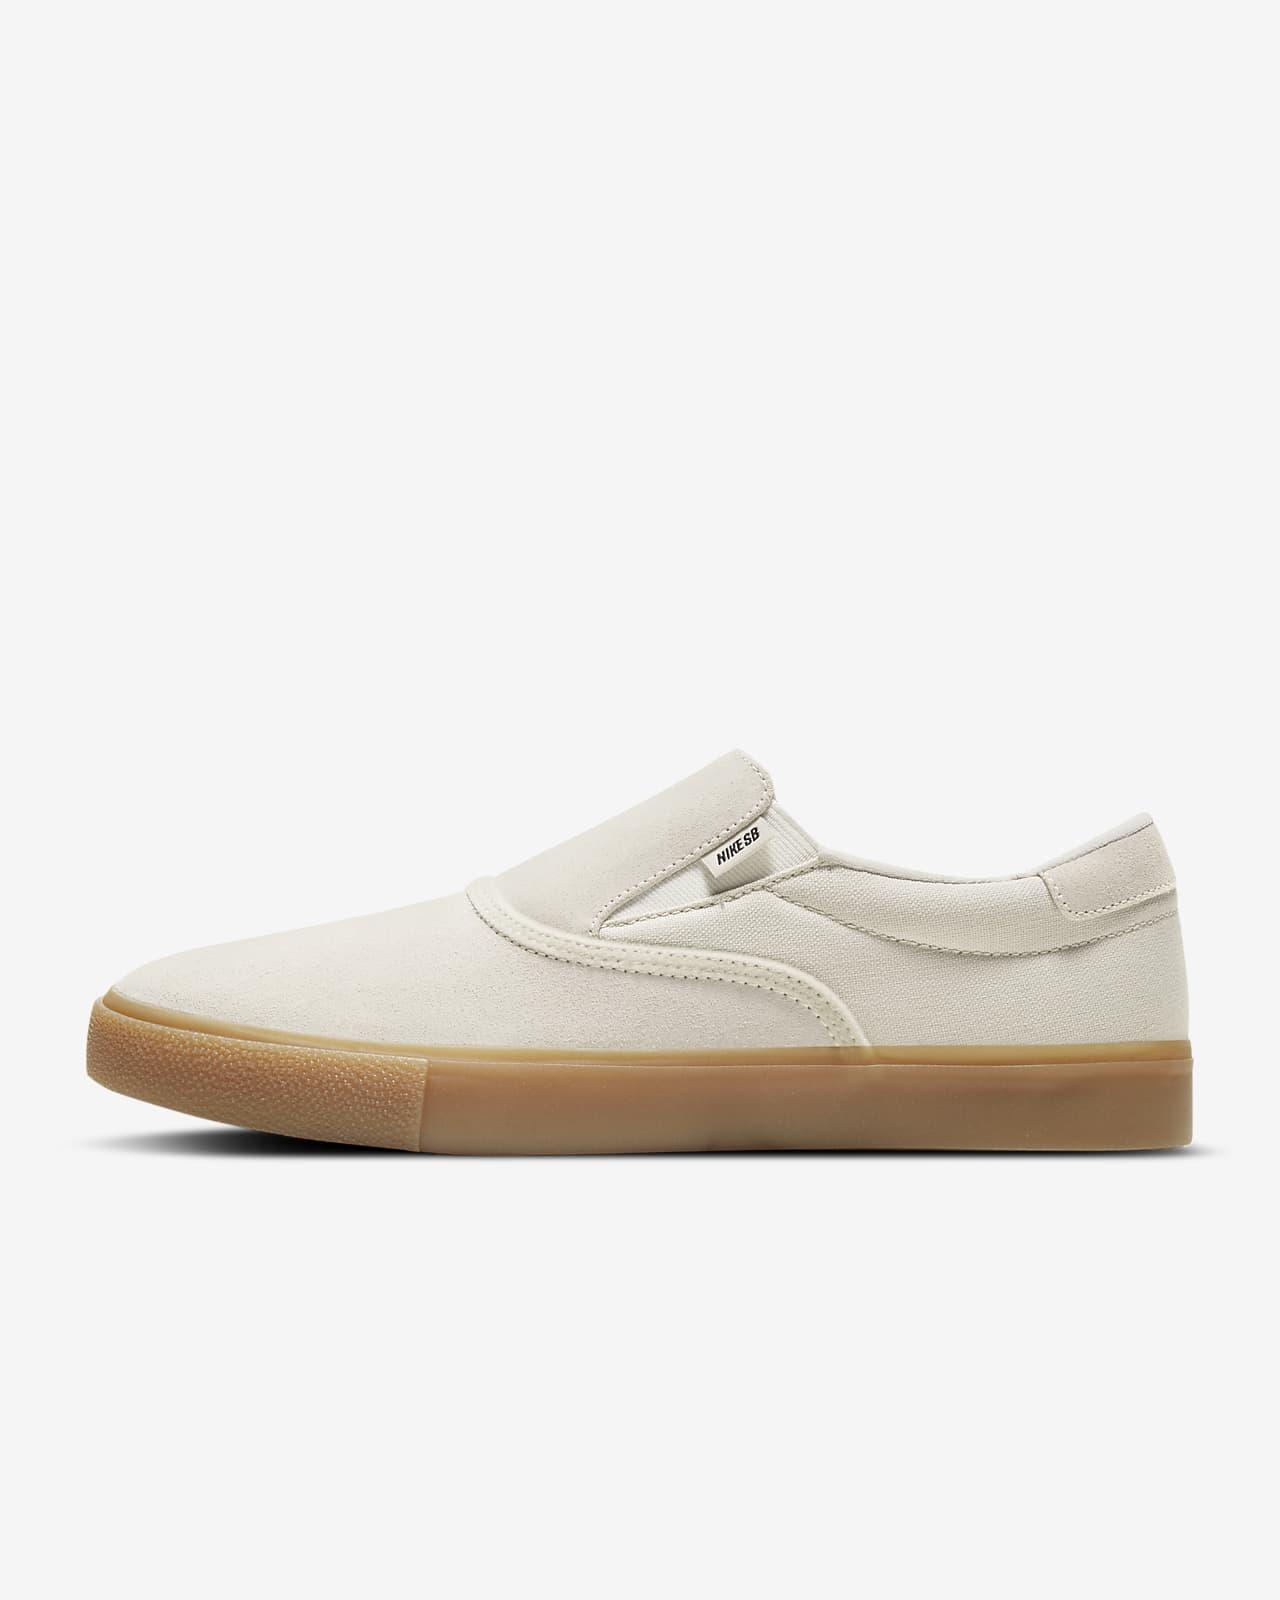 Chaussure de skateboard Nike SB Zoom Verona Slip. Nike LU